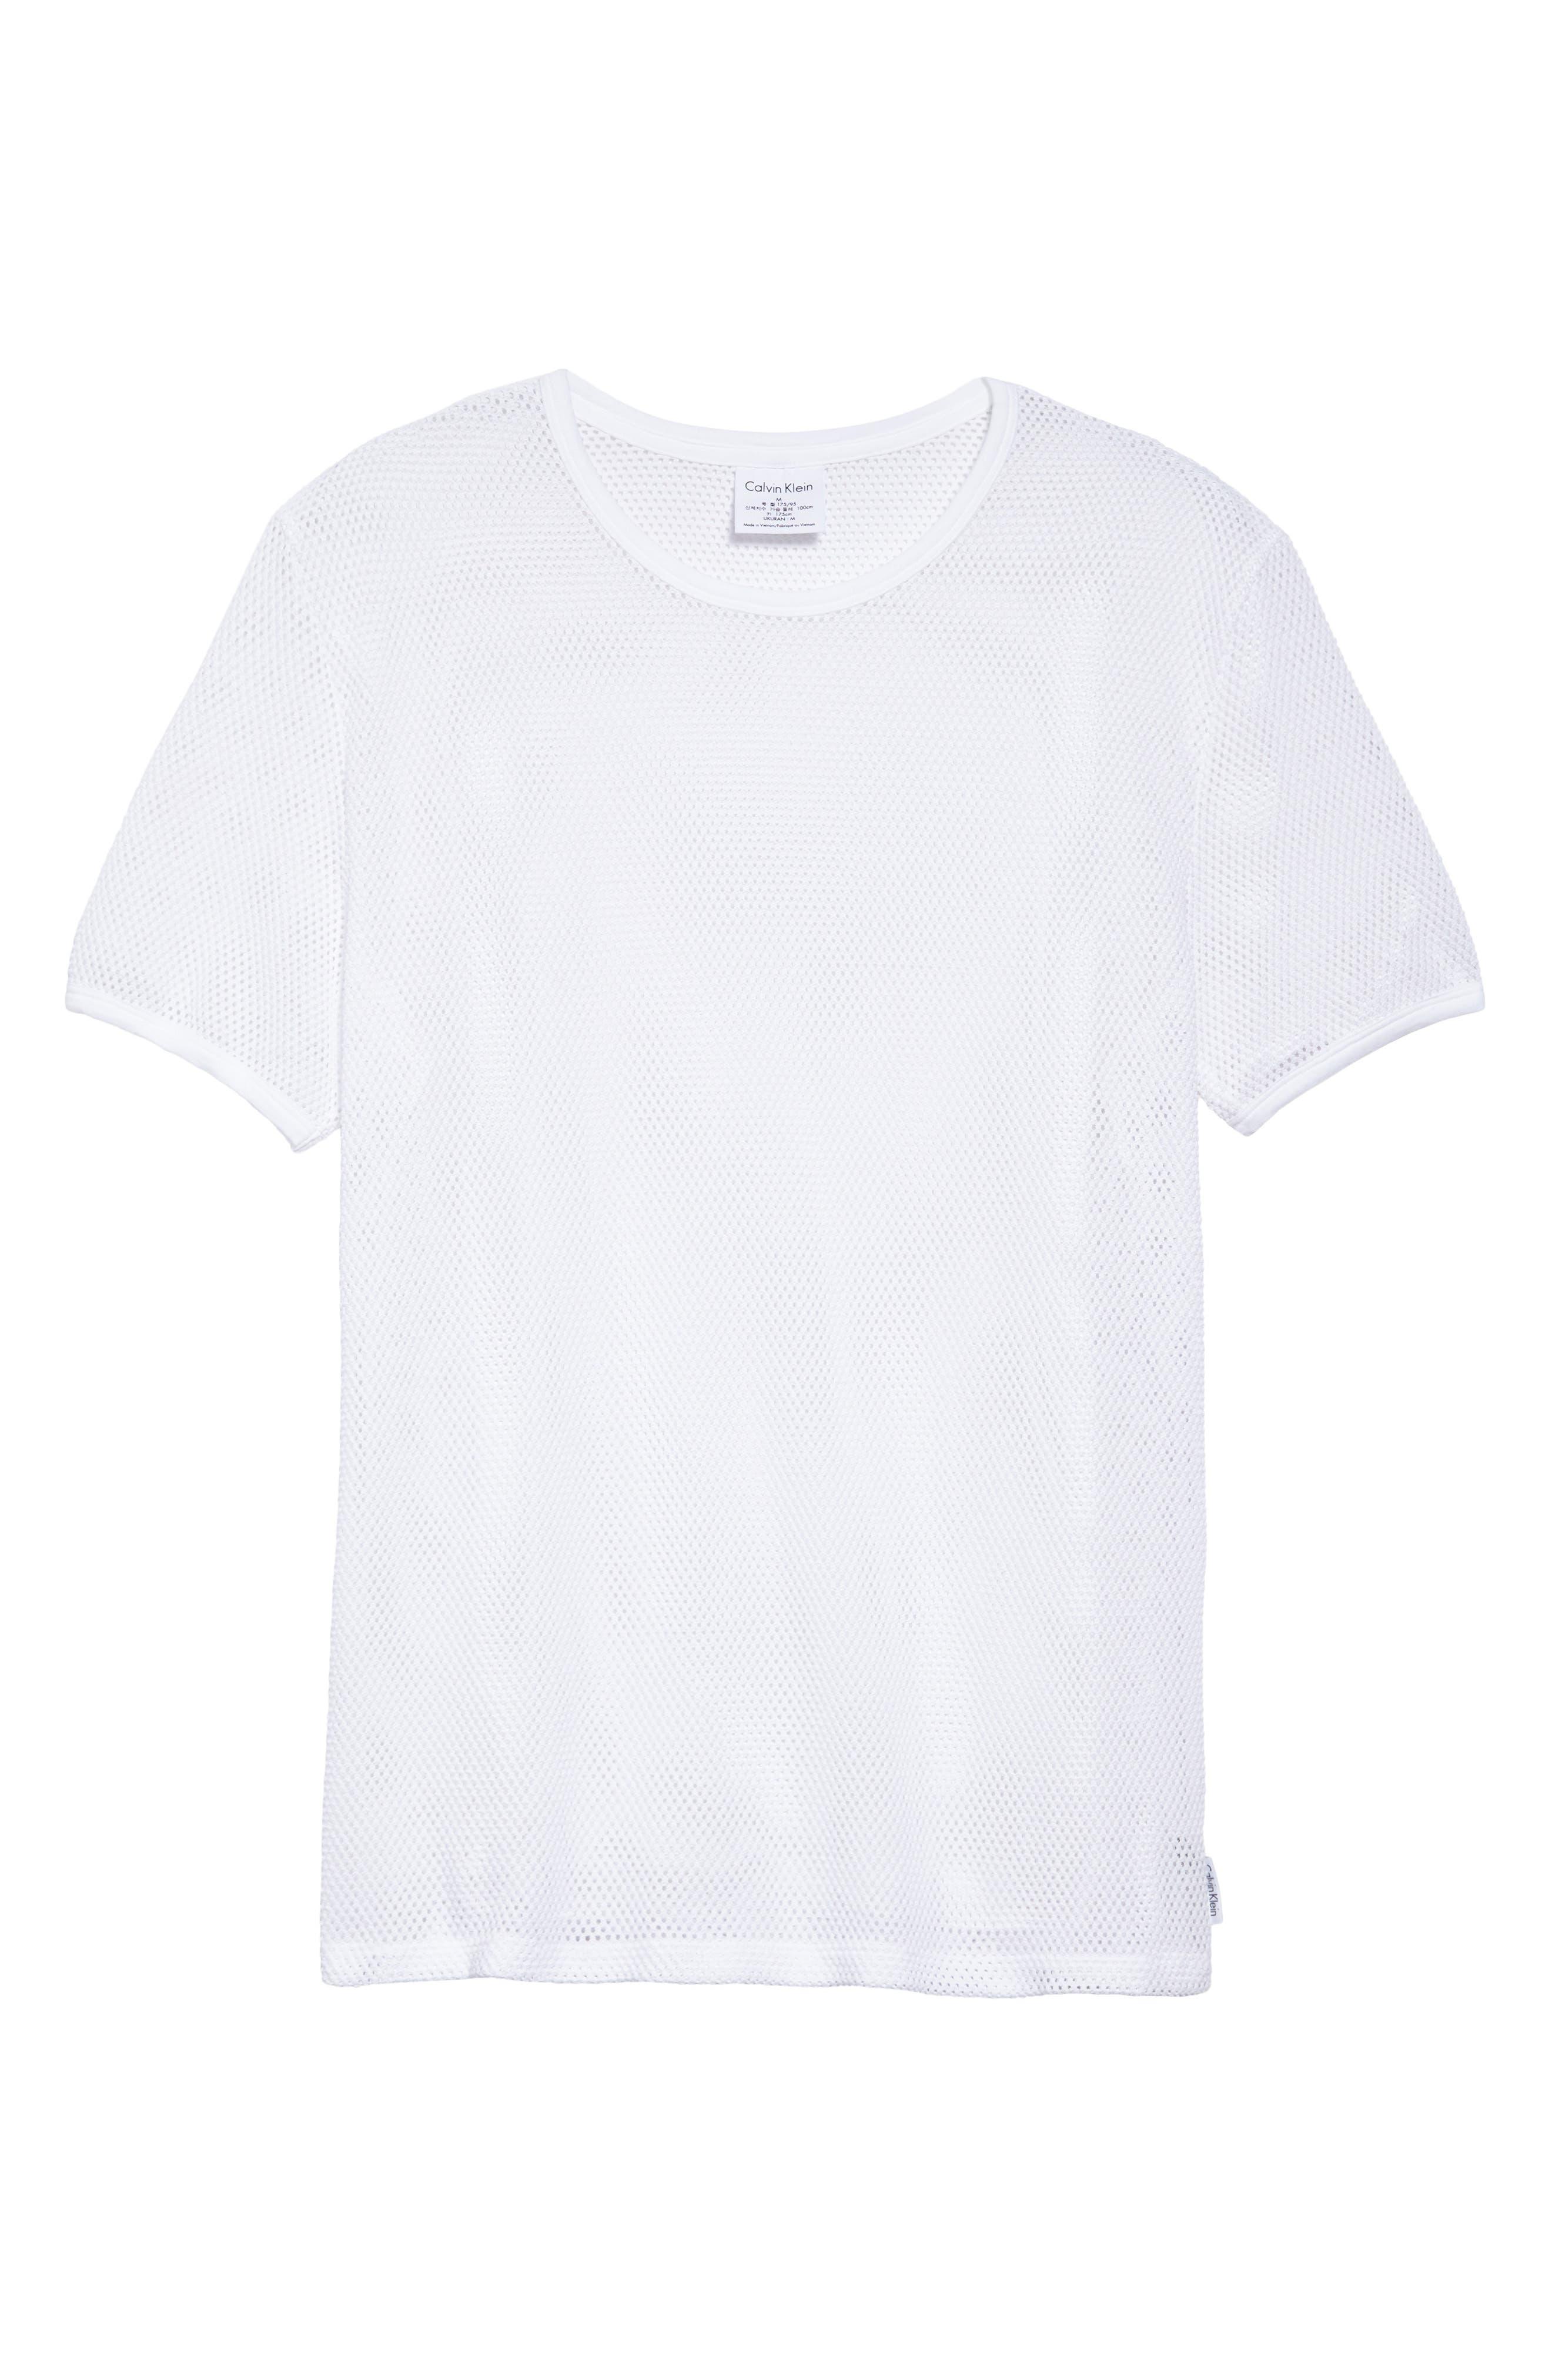 Stretch Mesh T-Shirt,                             Alternate thumbnail 6, color,                             White